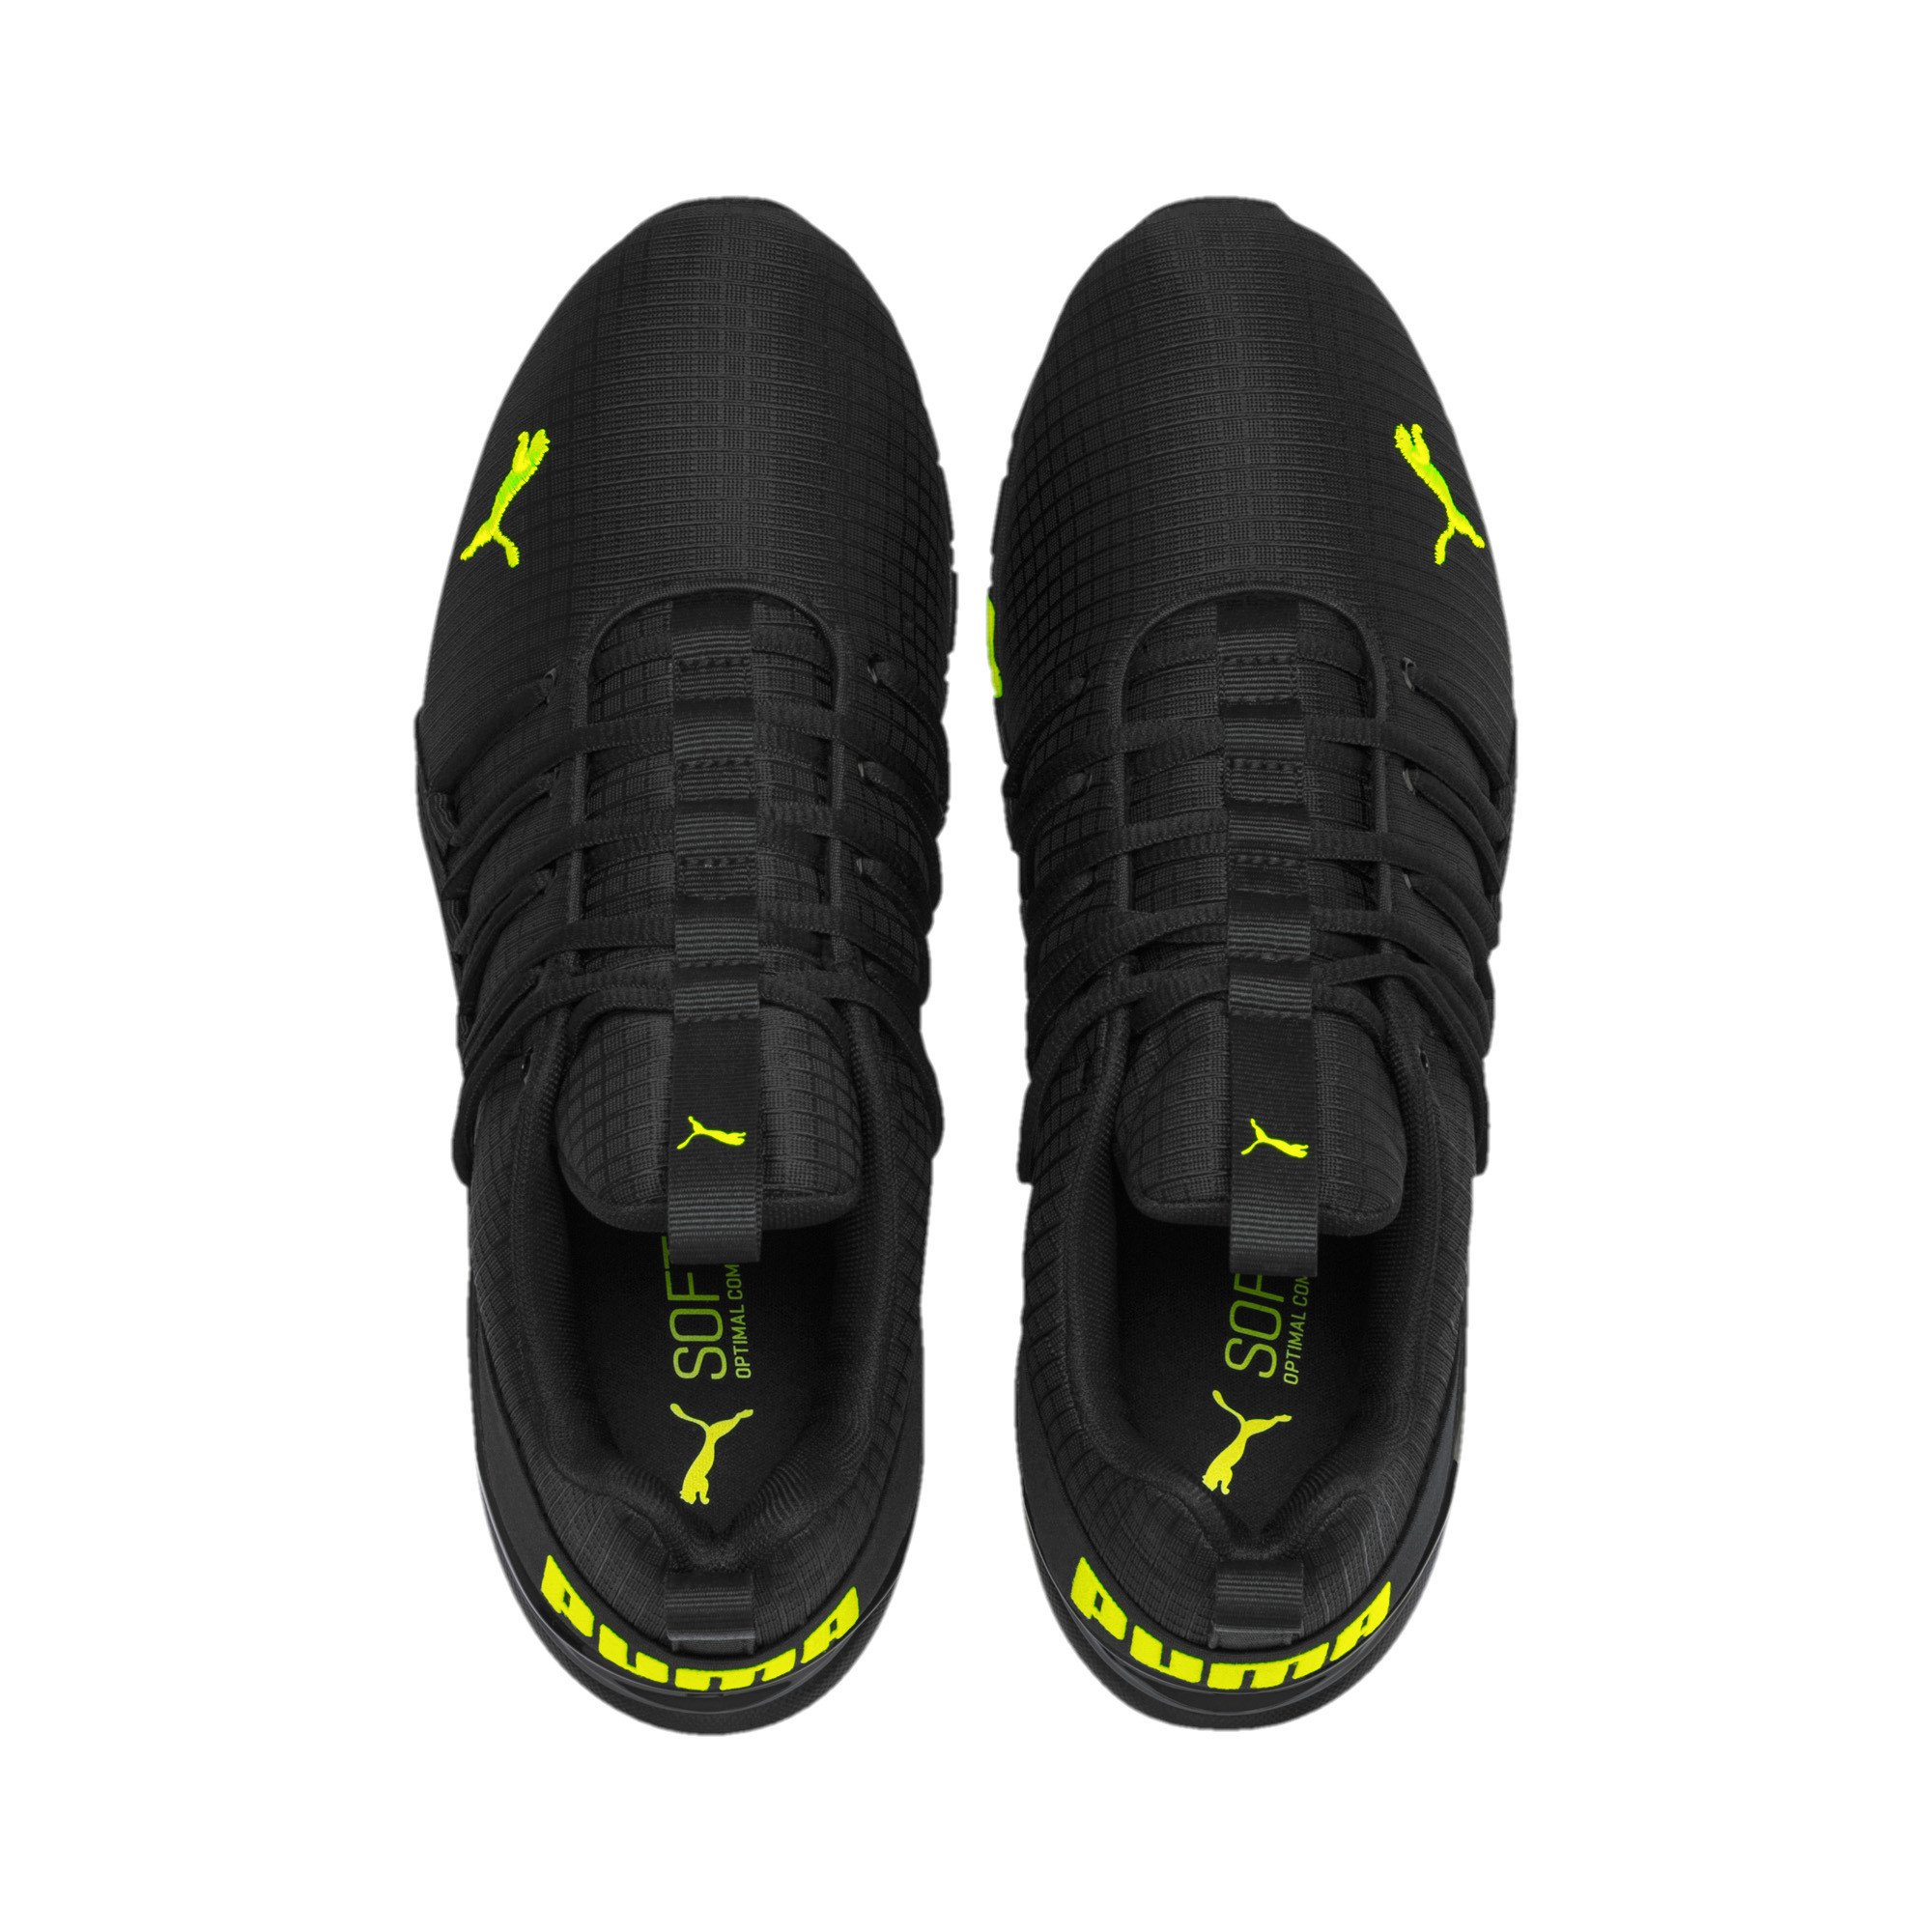 PUMA-Men-039-s-Axelion-Rip-Training-Shoes thumbnail 15